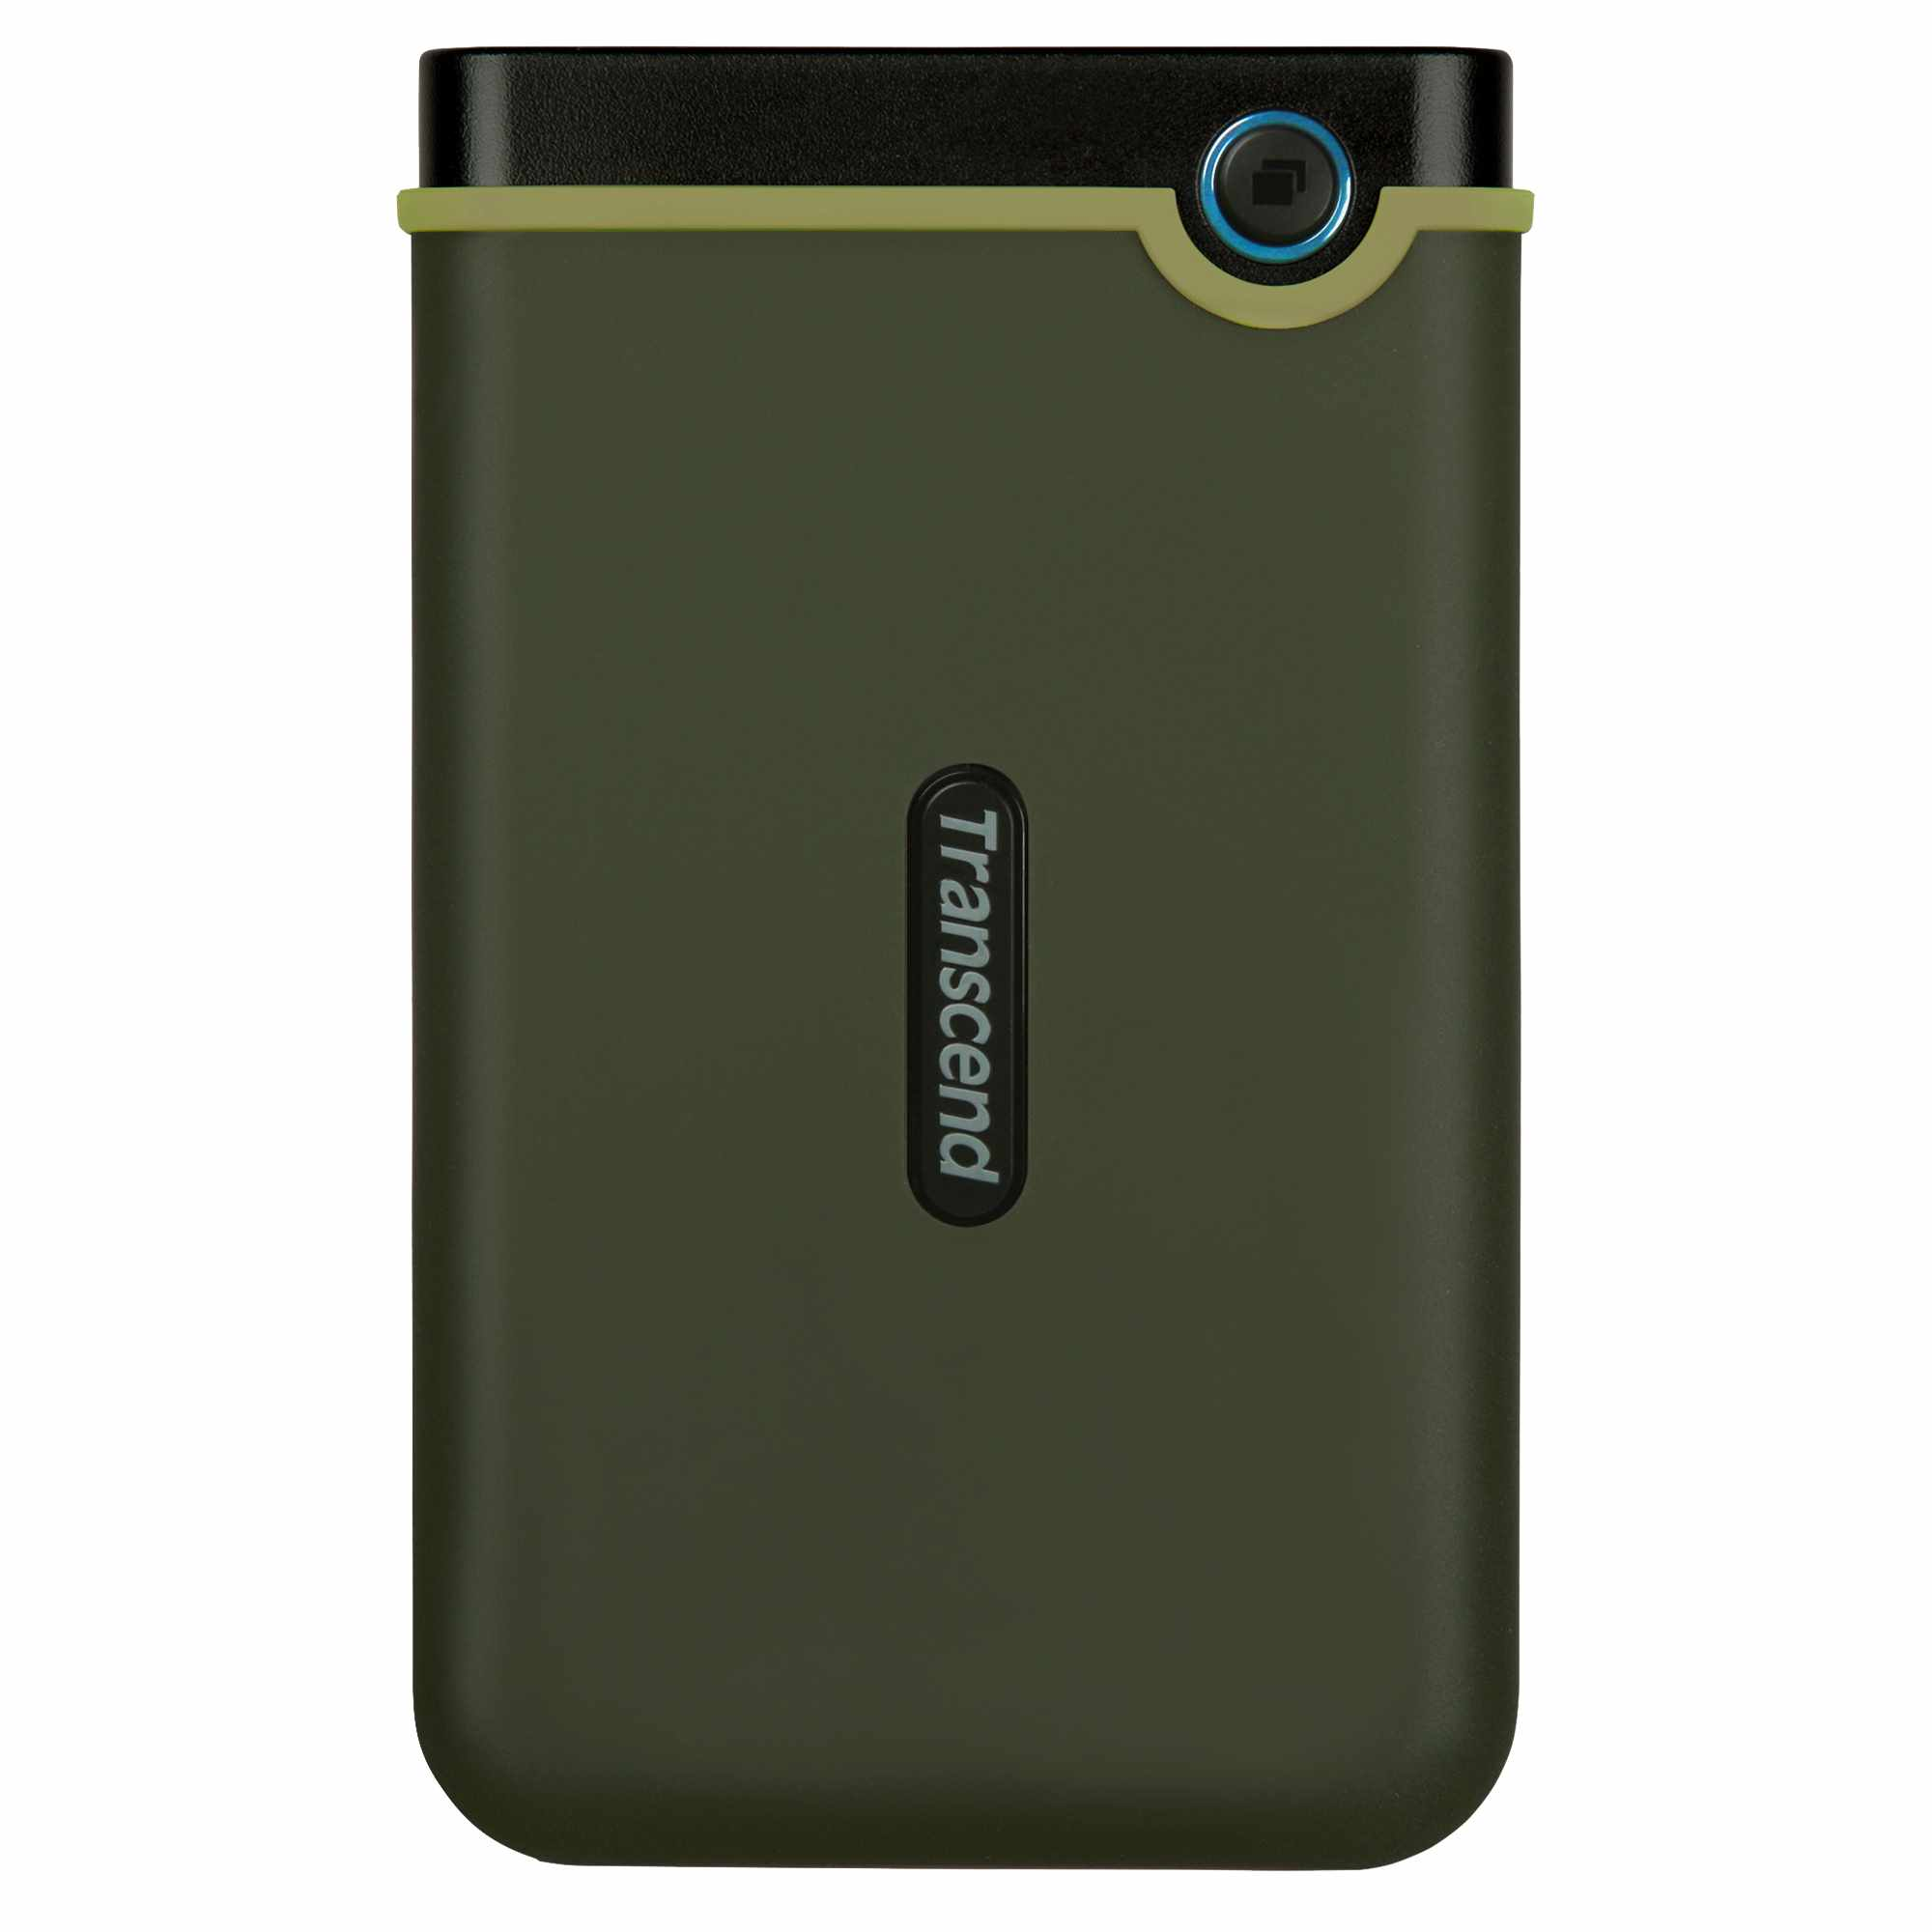 "TRANSCEND externí HDD 2,5"" USB 3.0 StoreJet 25M3G, Slim, 1TB, Black (SATA, Rubber Case, Anti-Sh"